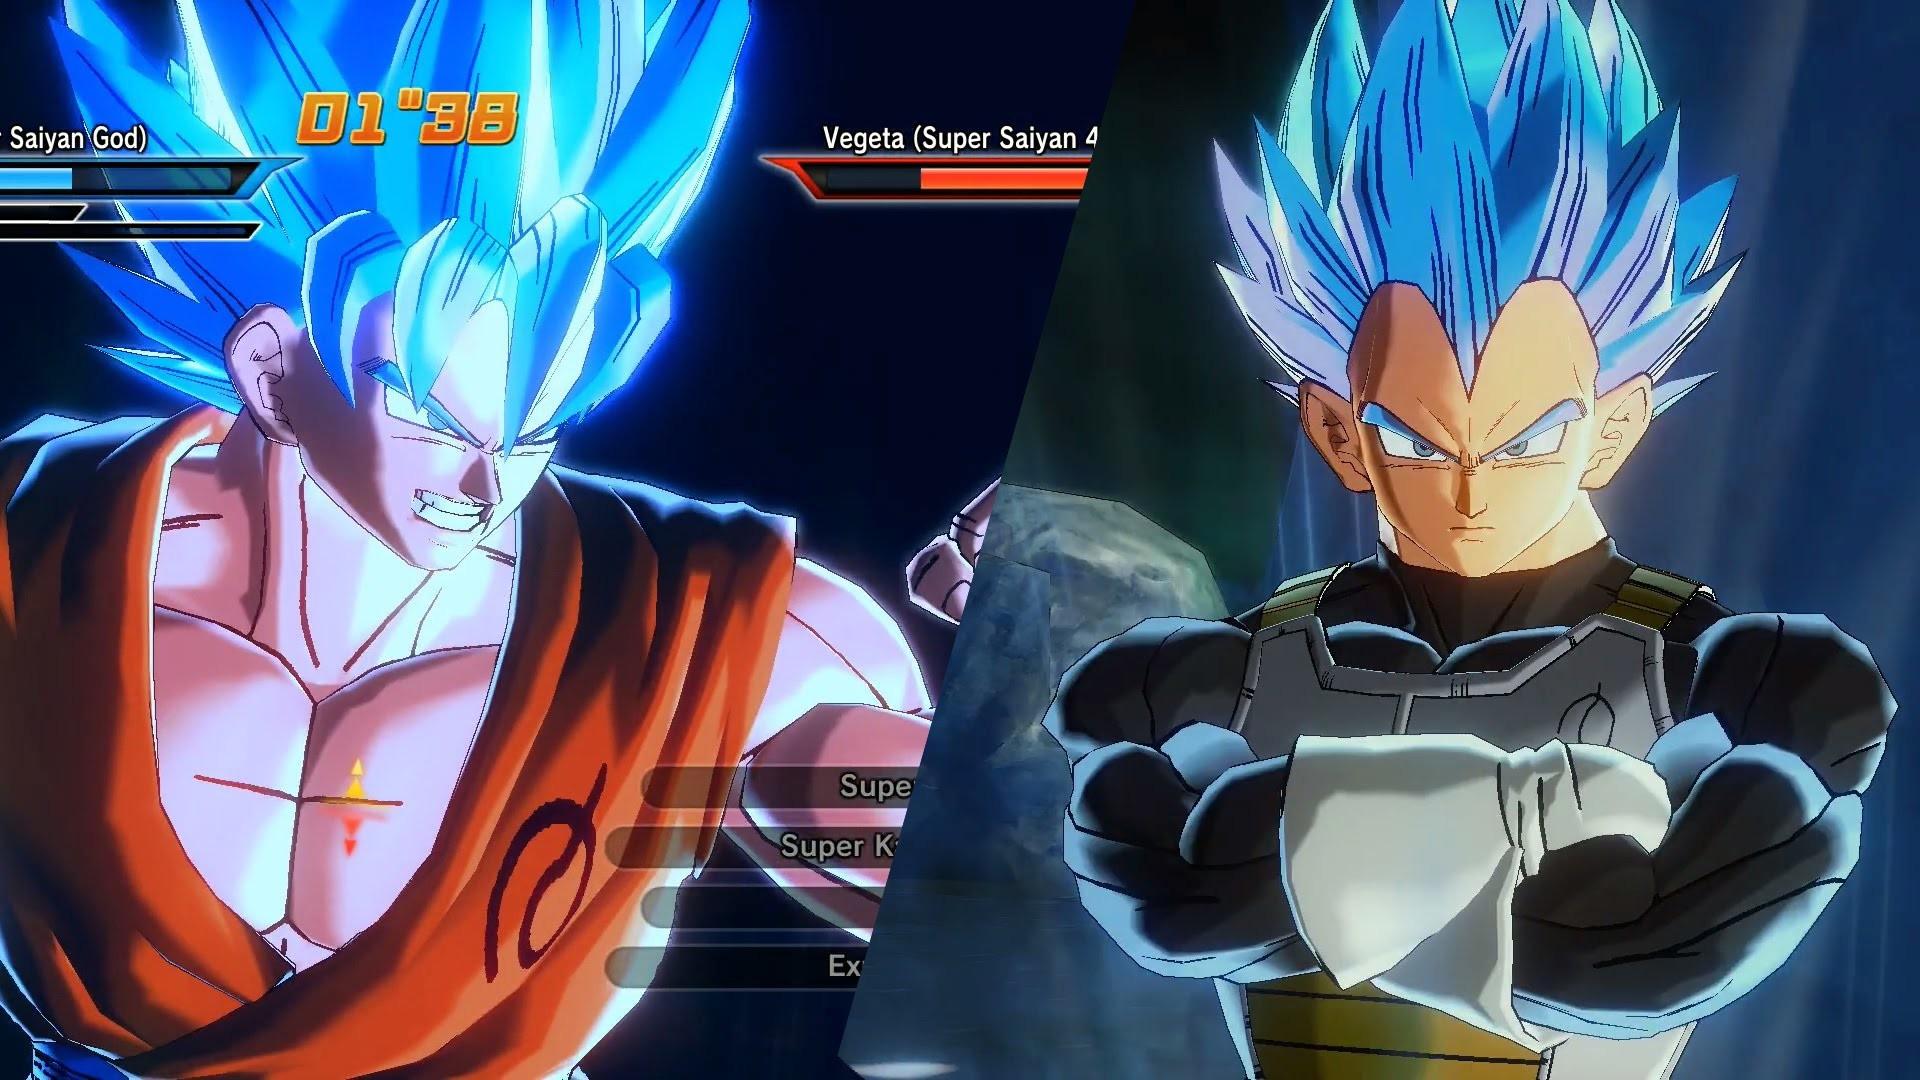 Super Saiyan 4 Goku And Vegeta Wallpapers 60  Images